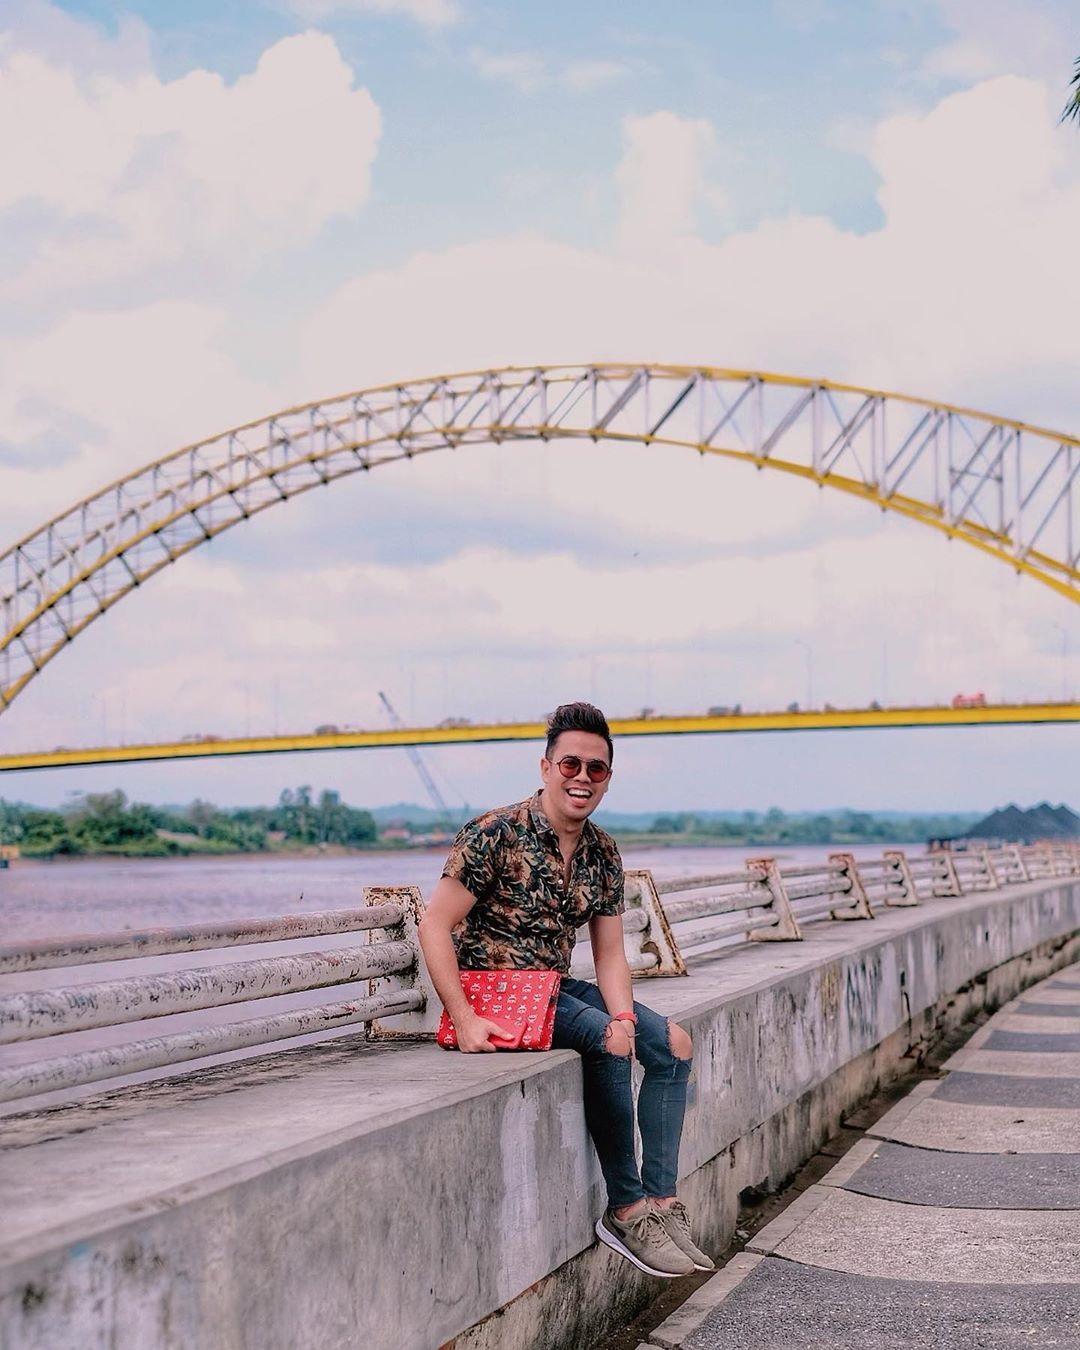 Jembatan Kutai Kartanegara Kalimantan Timur